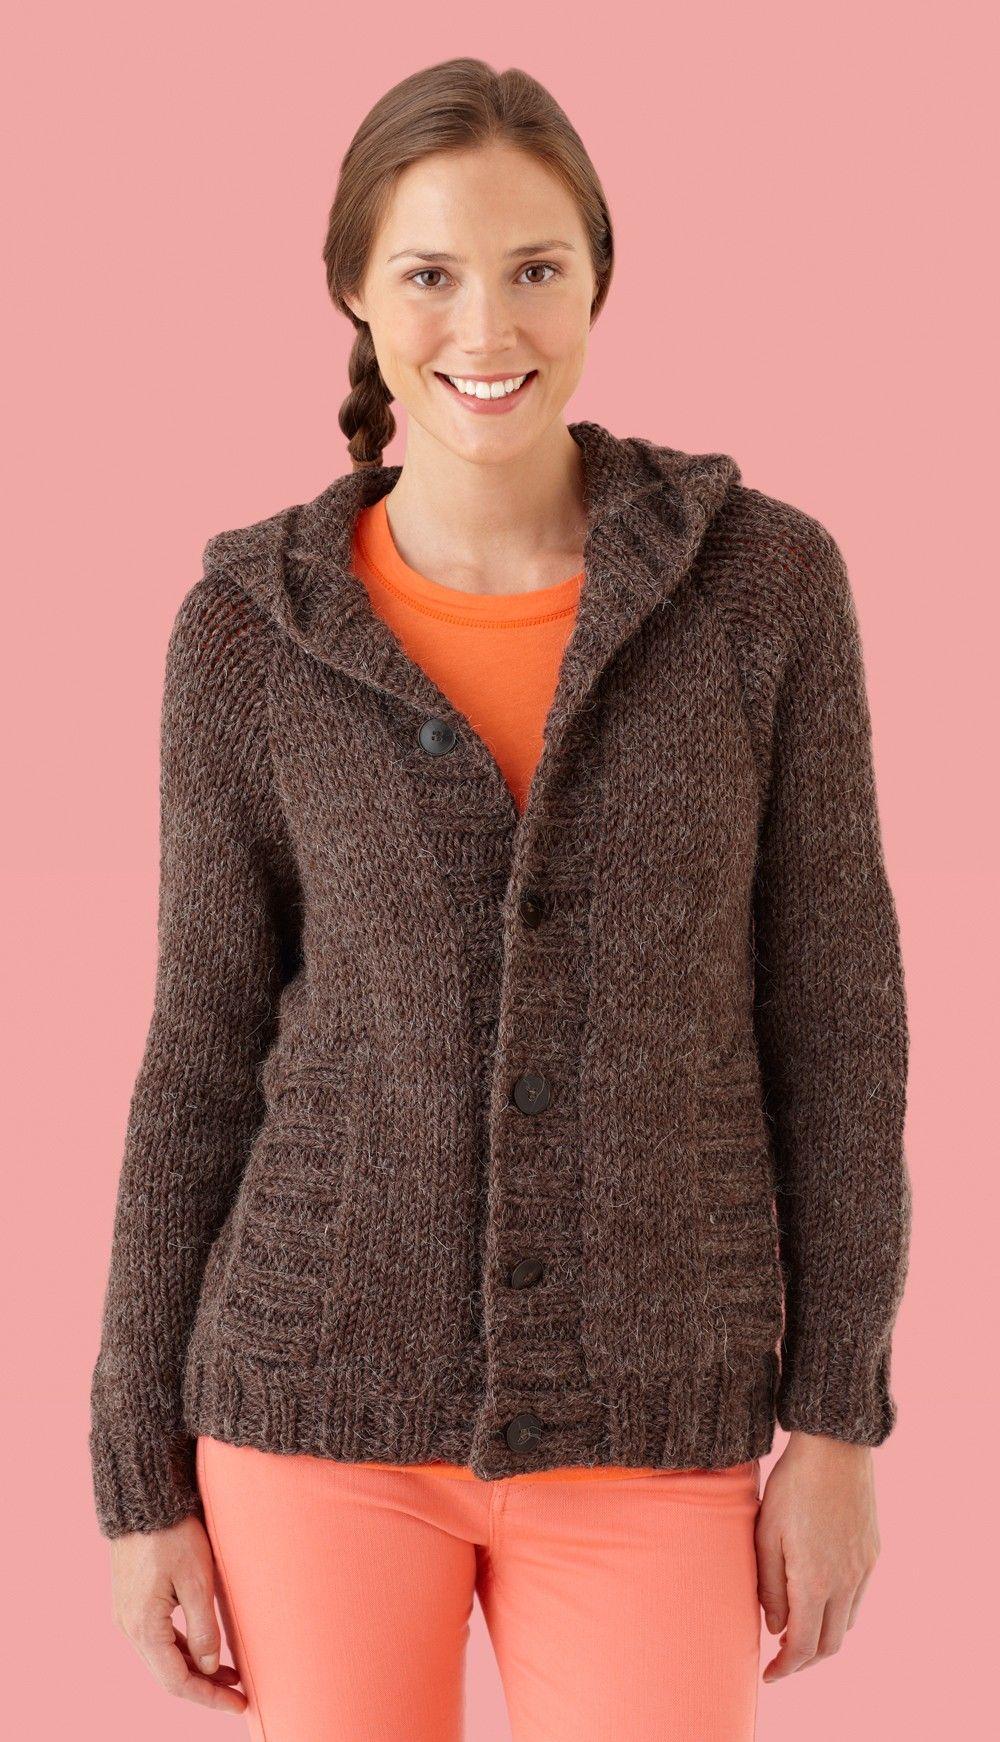 Hooded Cardigan Pattern (Knit) - Free Download | Crafting: Knitting ...